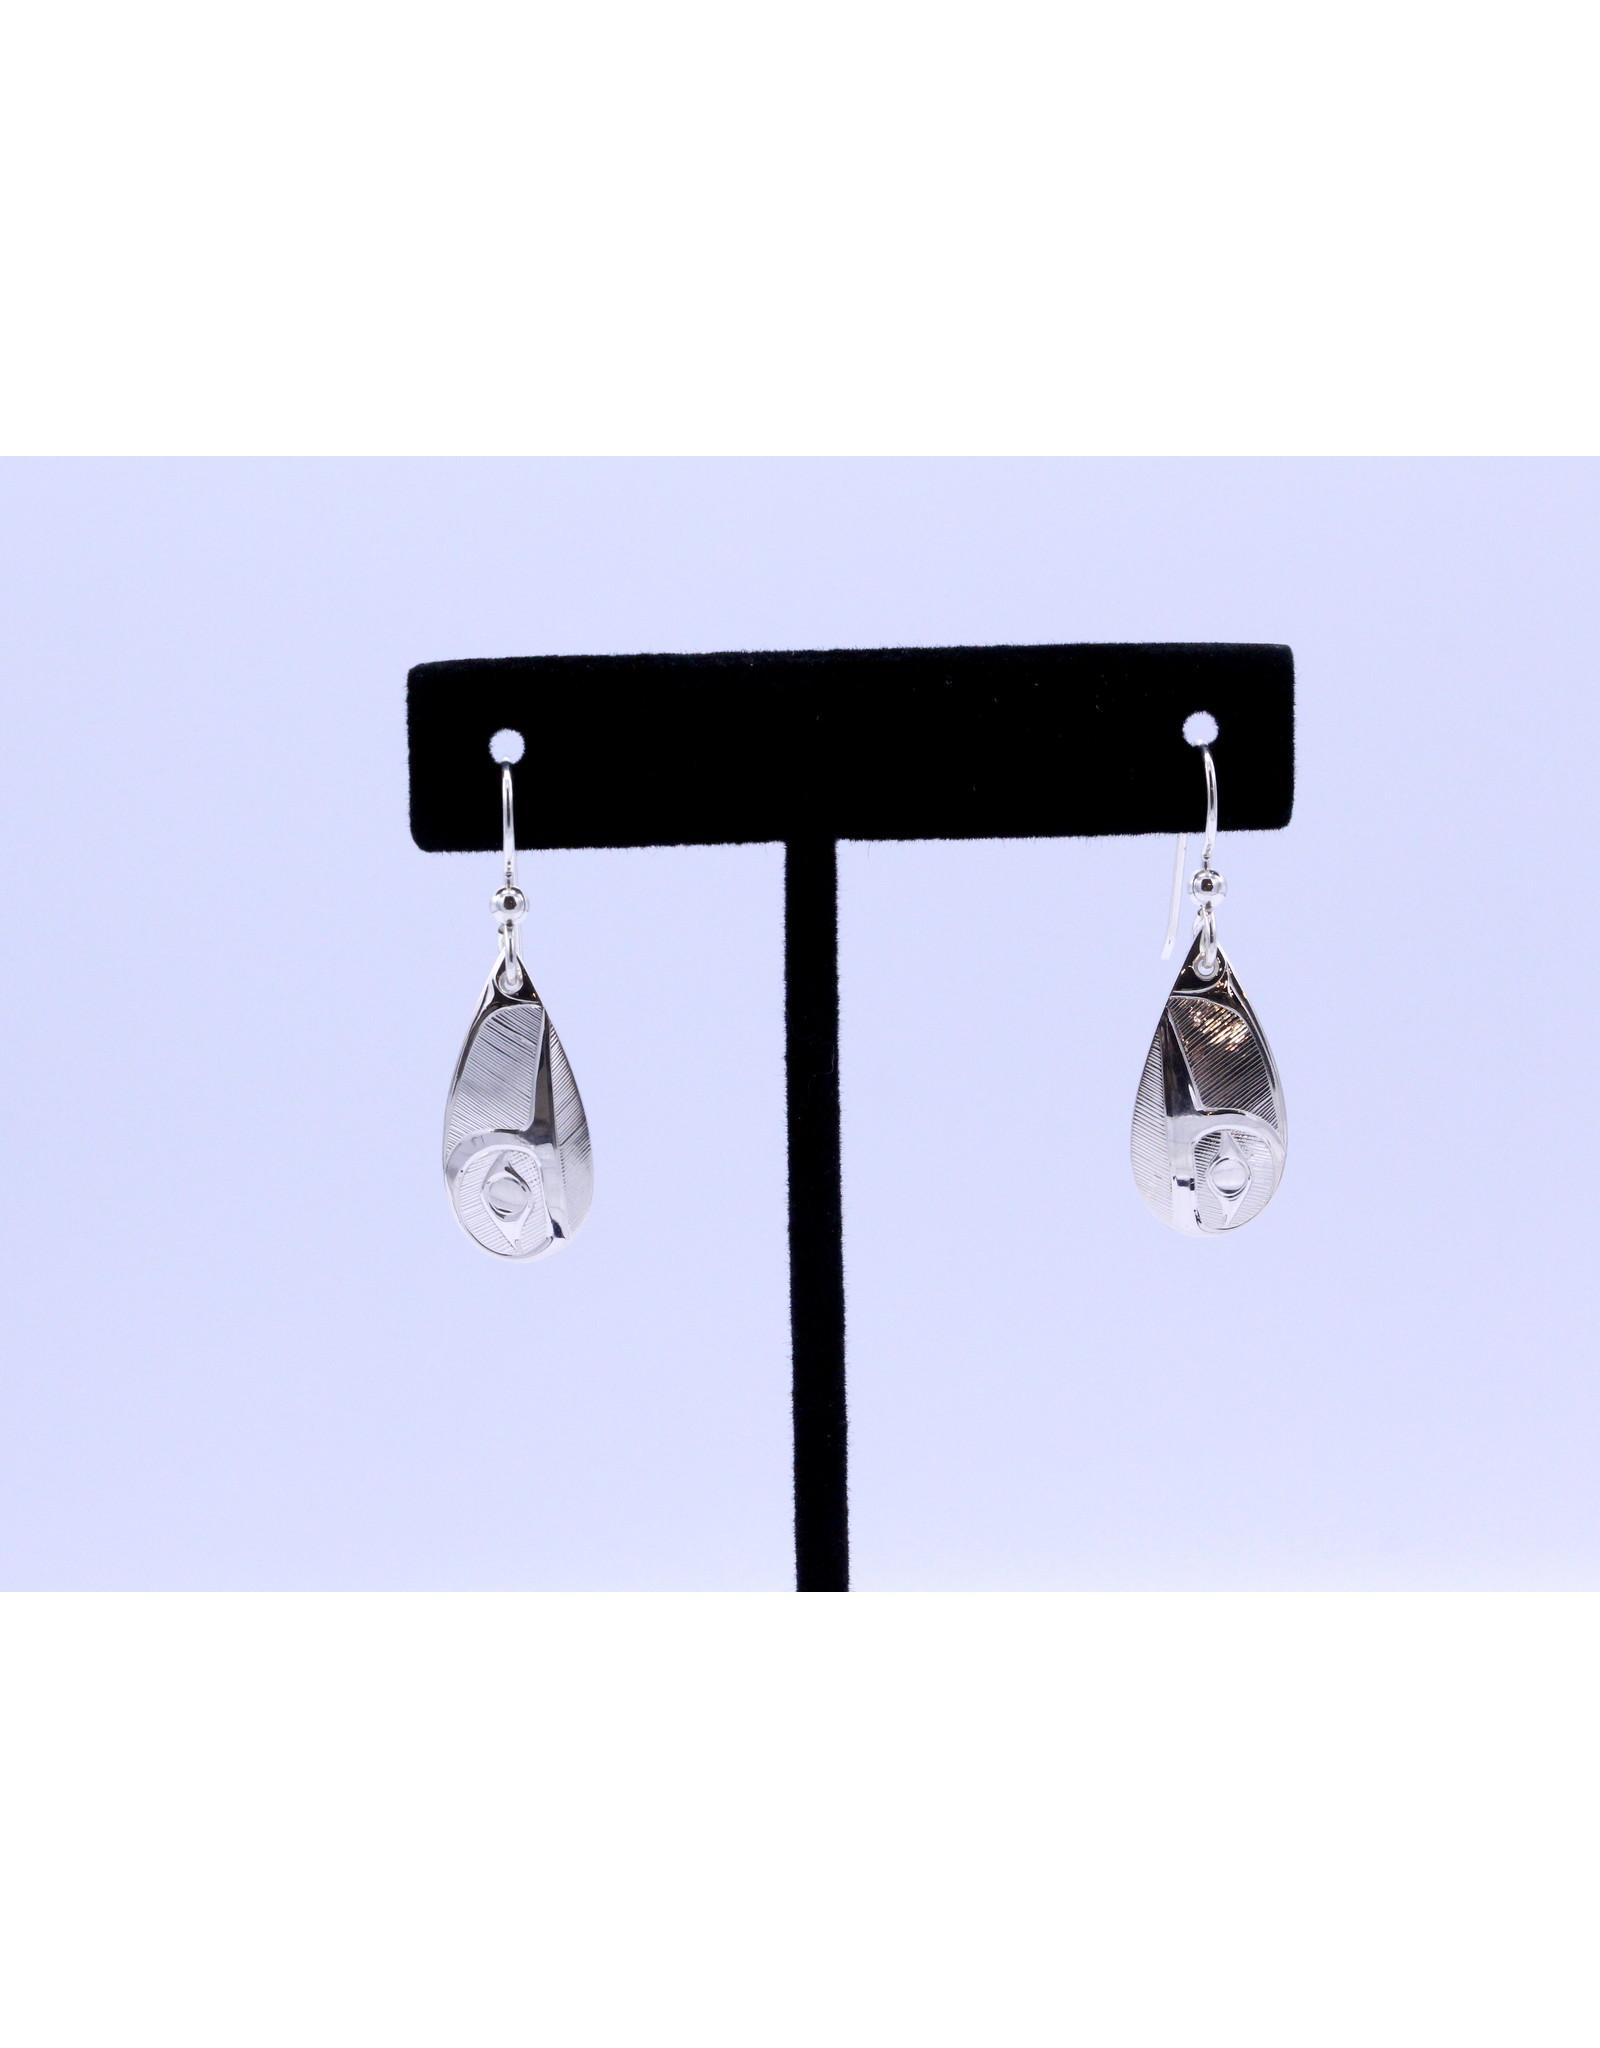 Hummingbirds Teardrop Earrings by Hollie Bear - HBE02